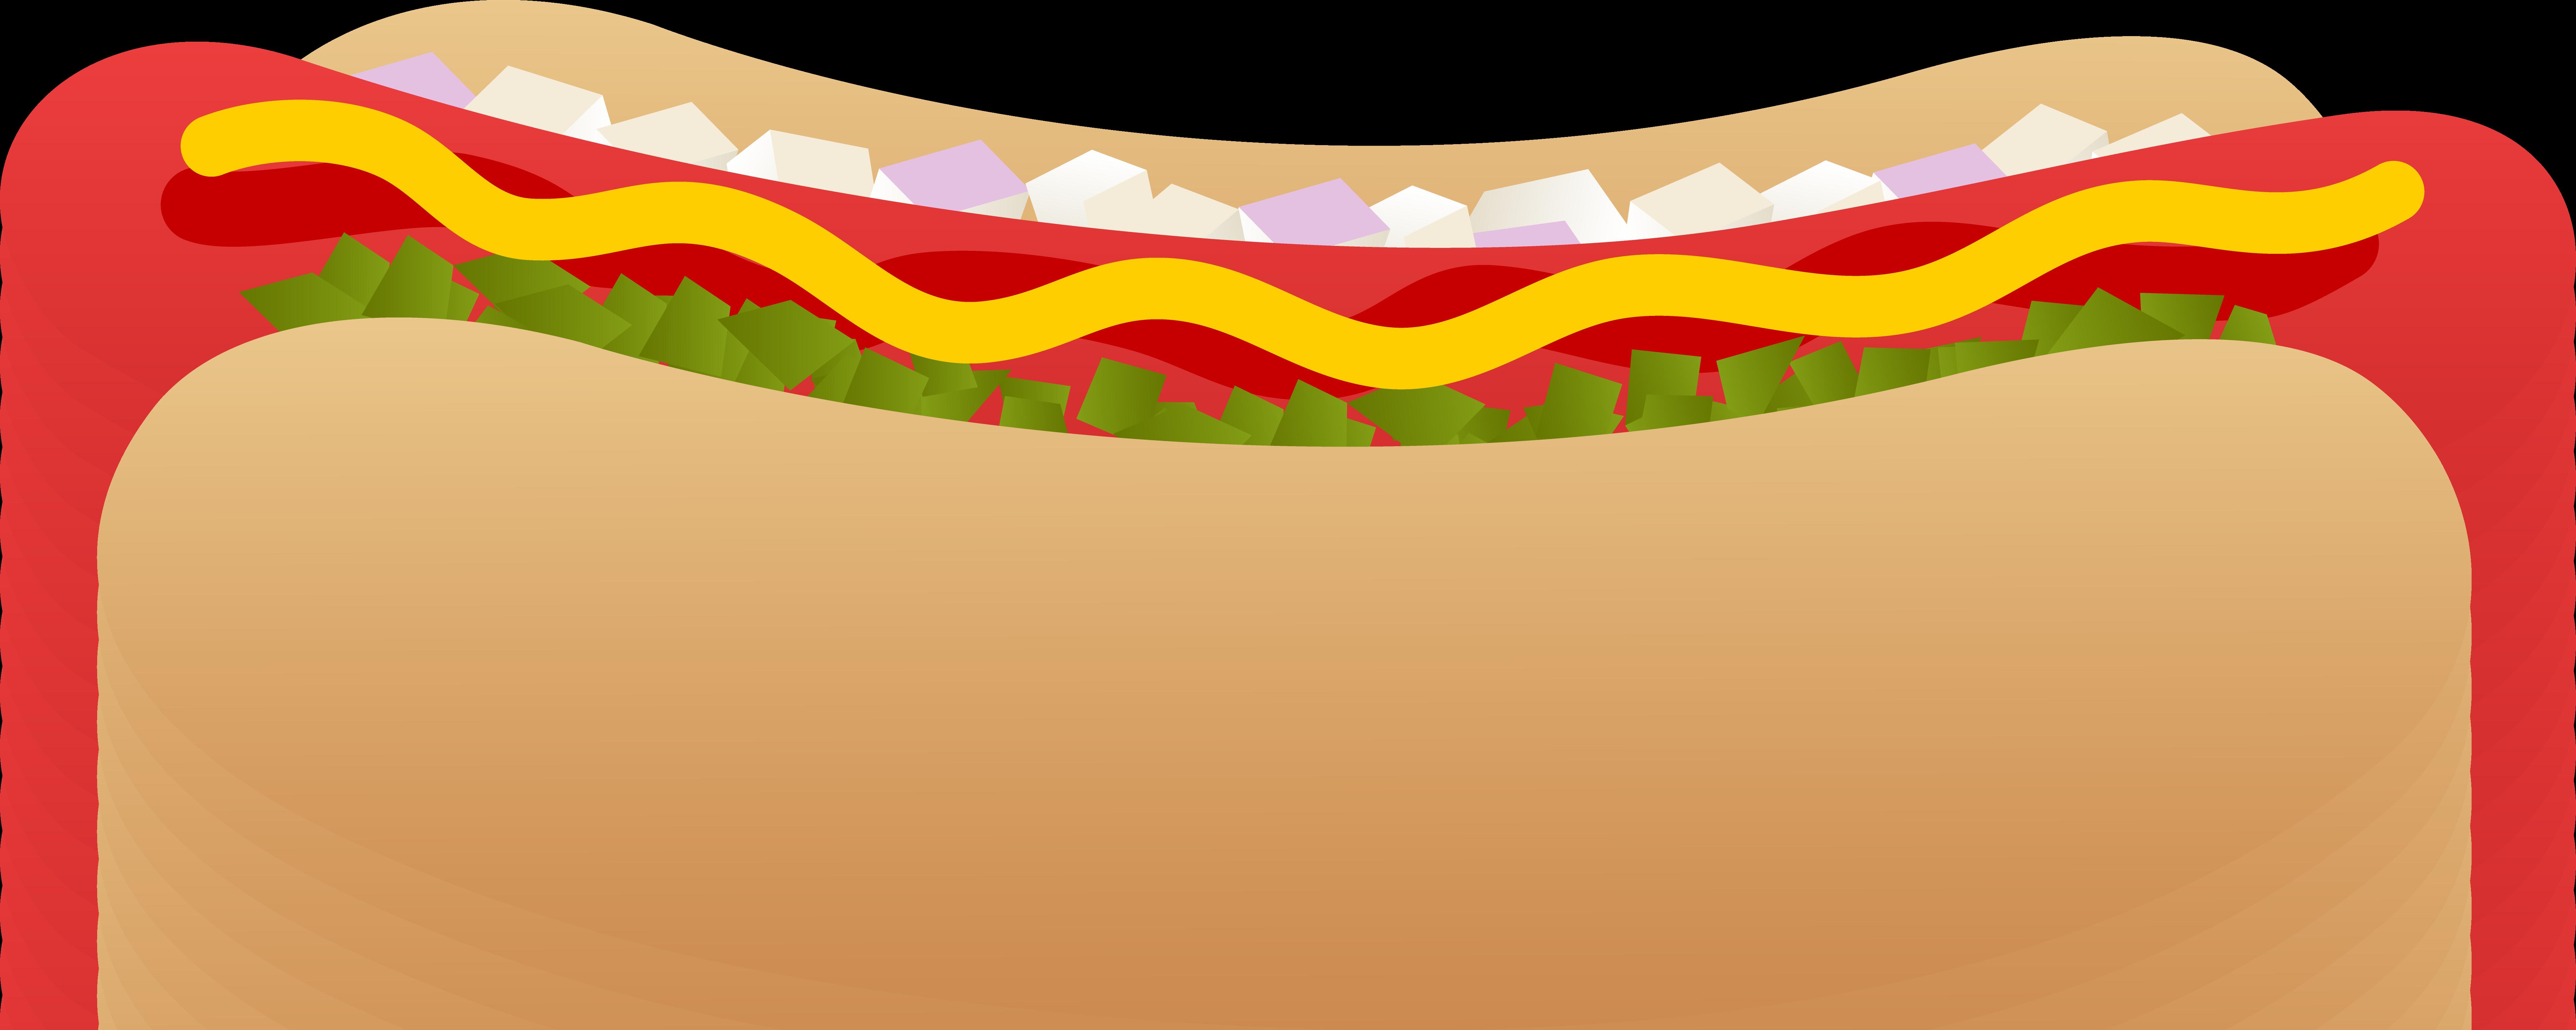 7846x3137 Hamburger Clipart Hot Dog